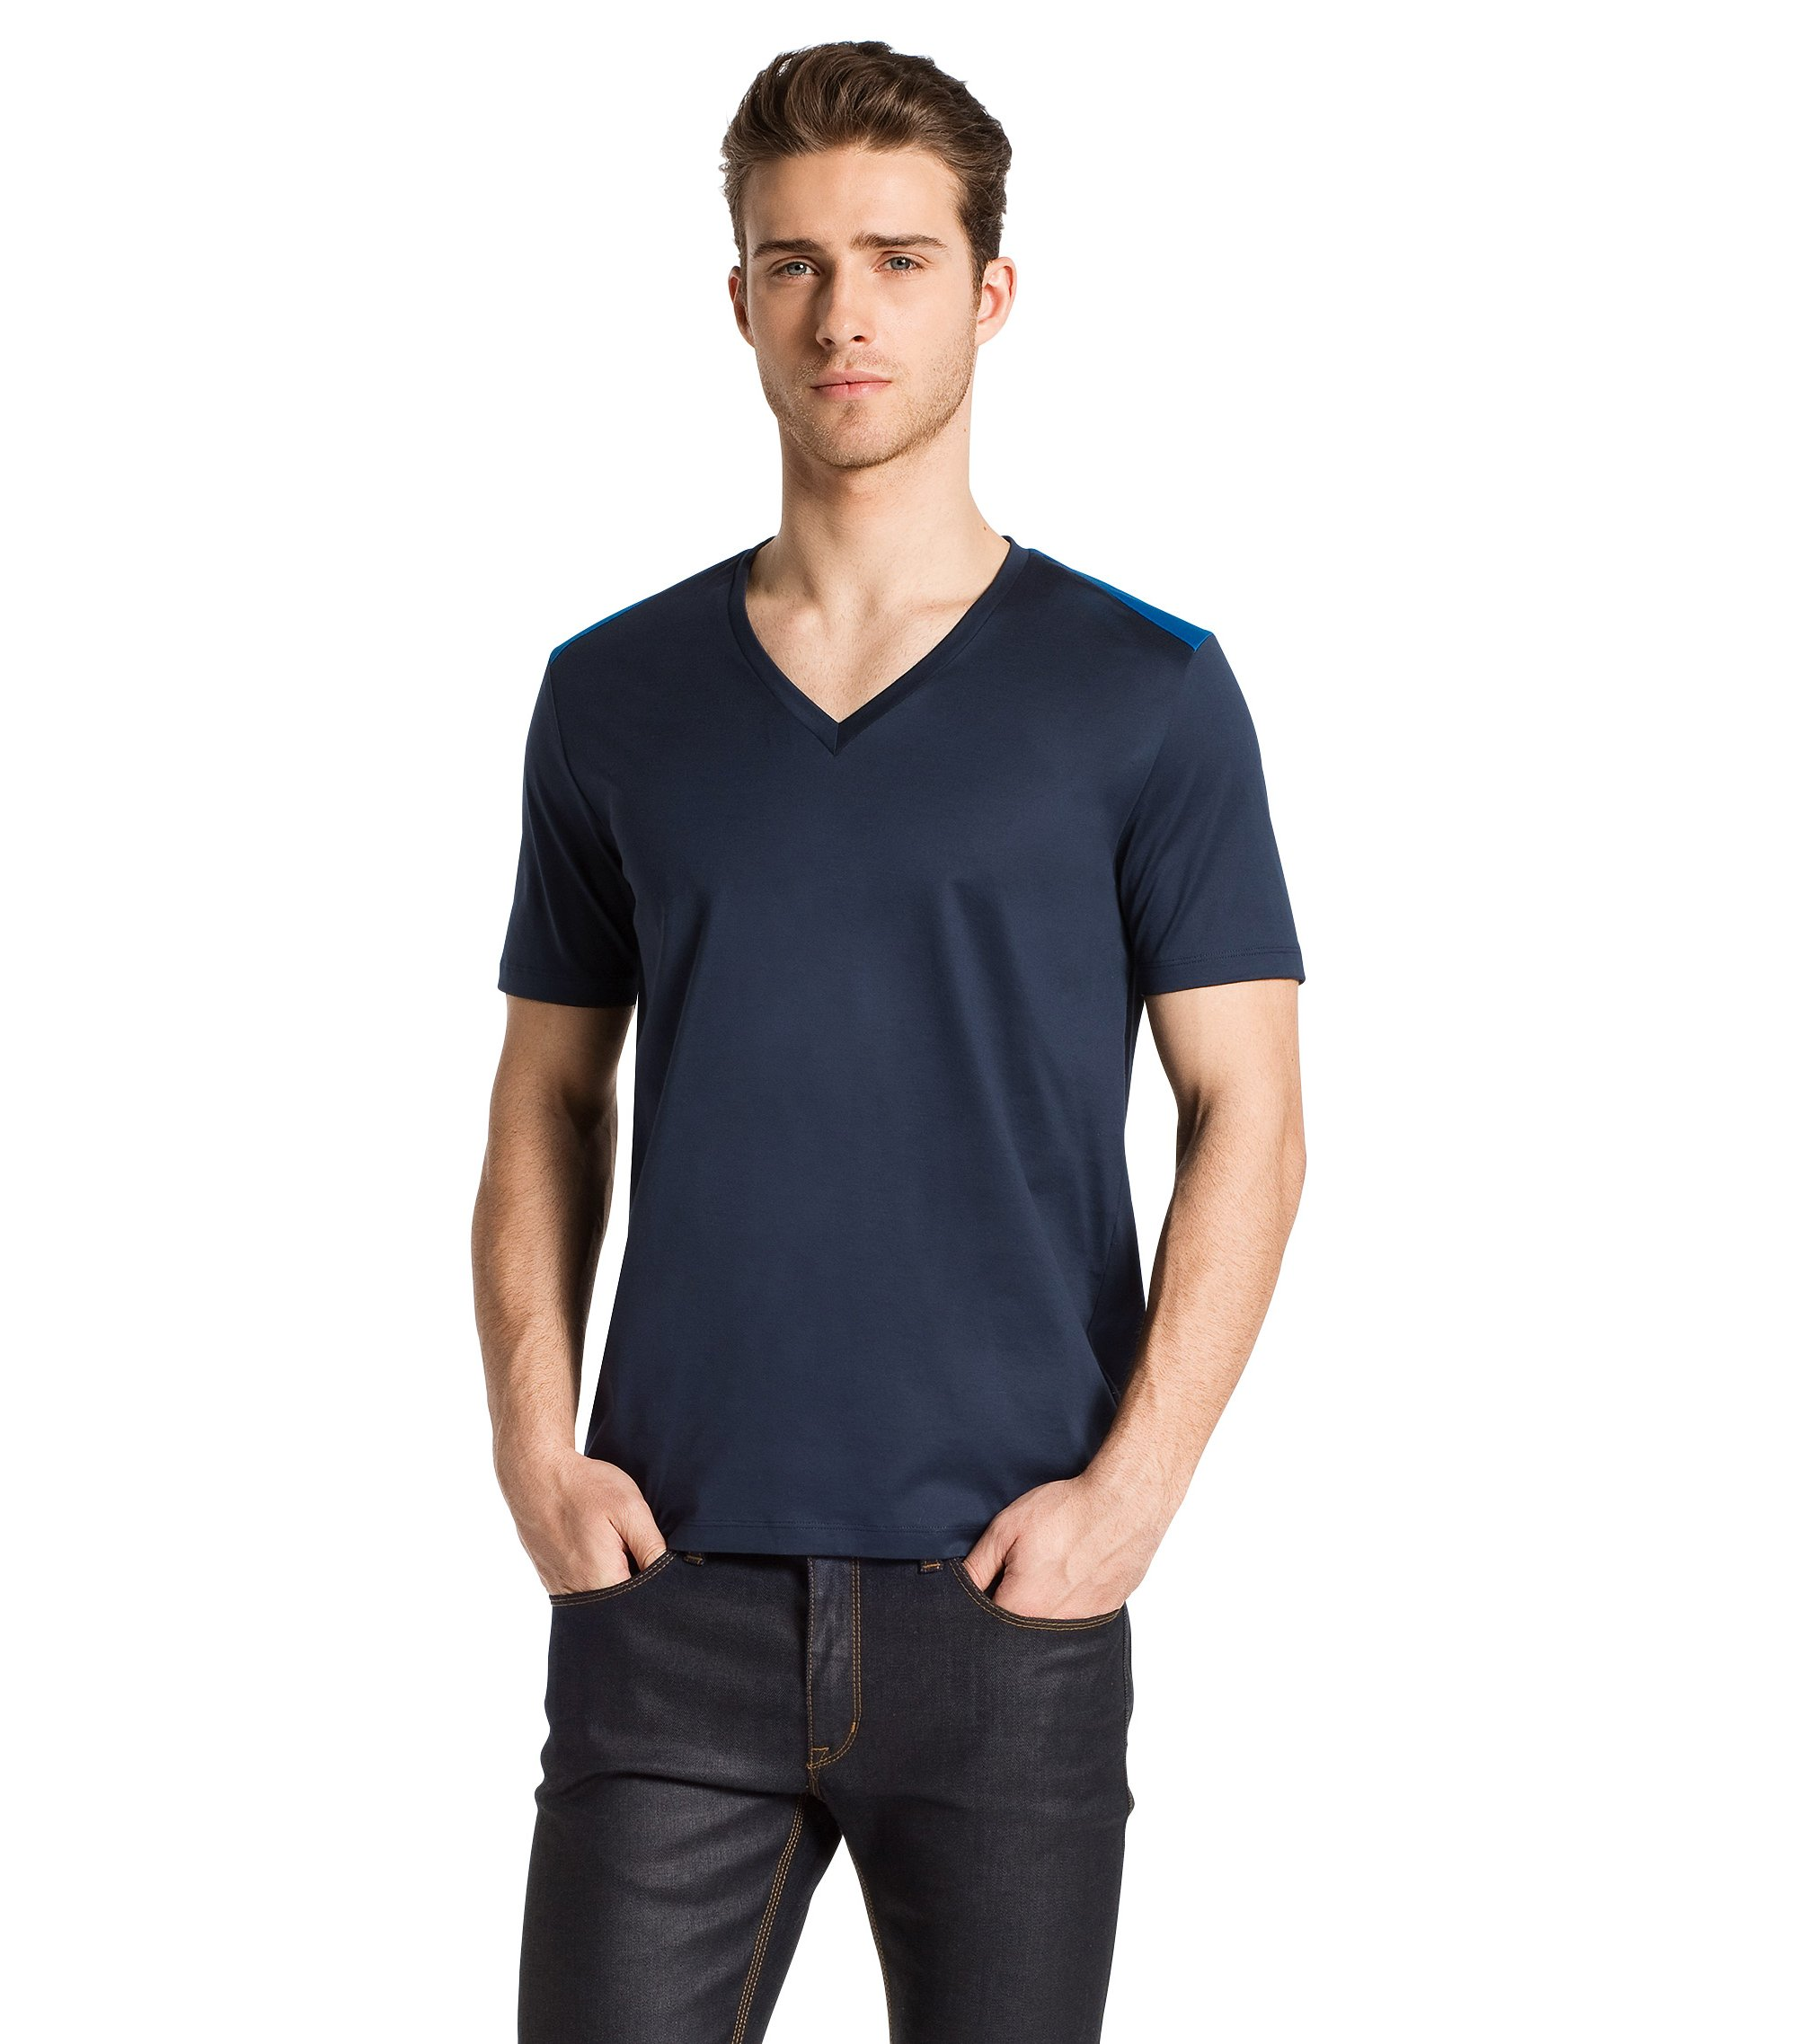 V-neck T-shirt 'Drapple', Dark Grey